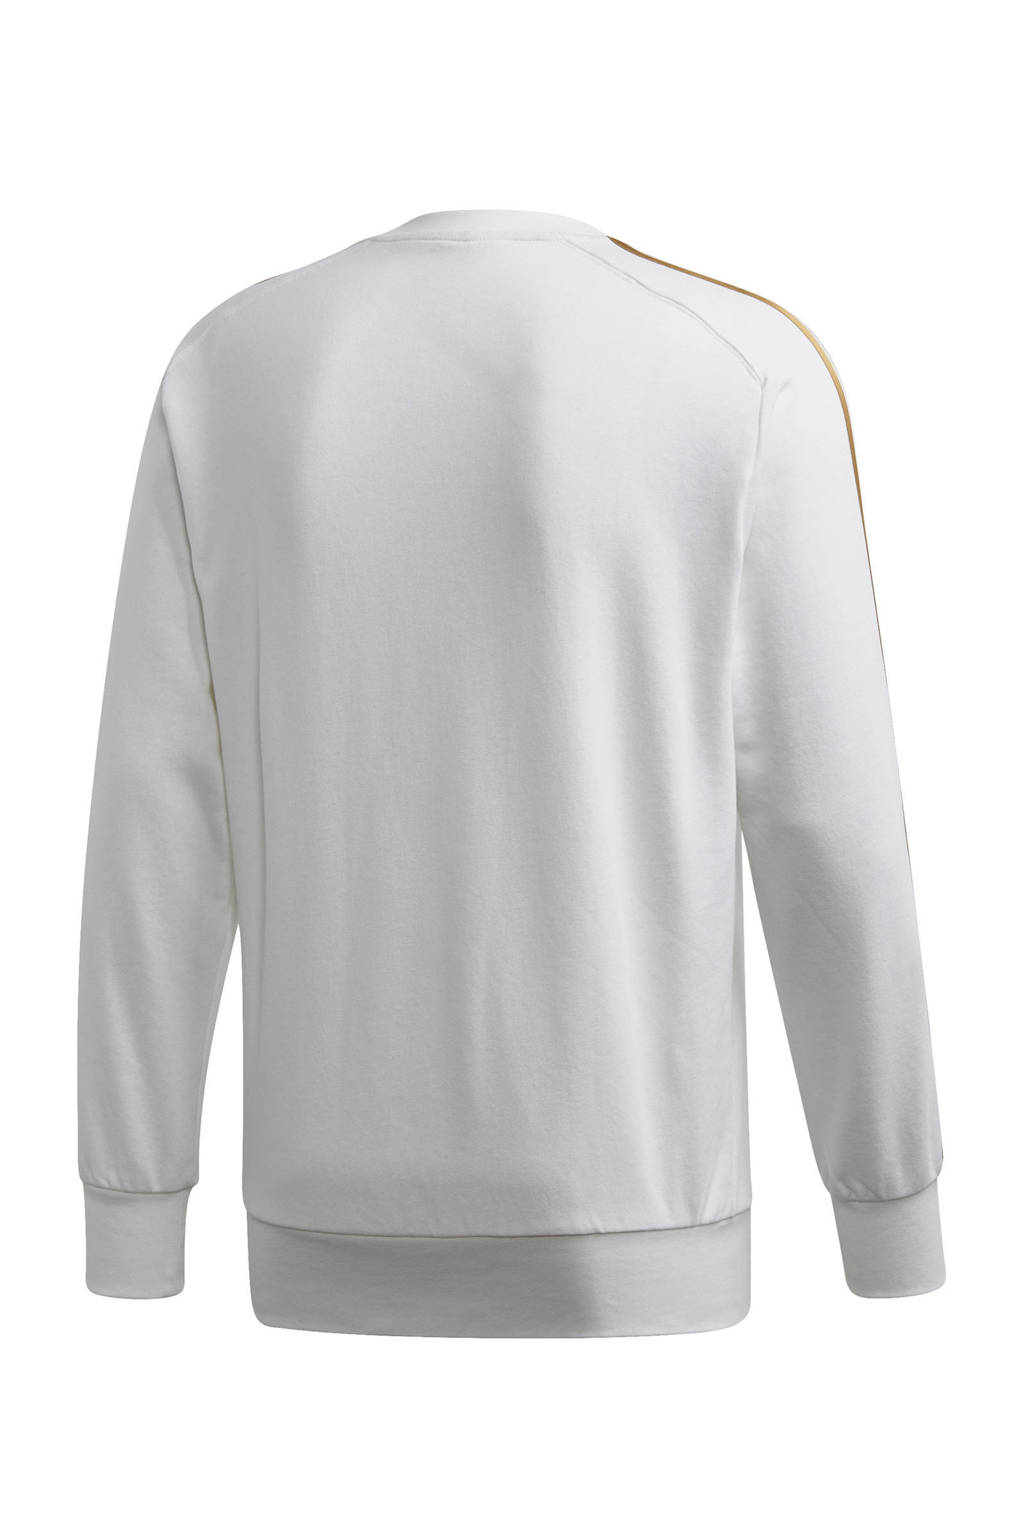 adidas Senior Real Madrid voetbalsweater, Wit/goud